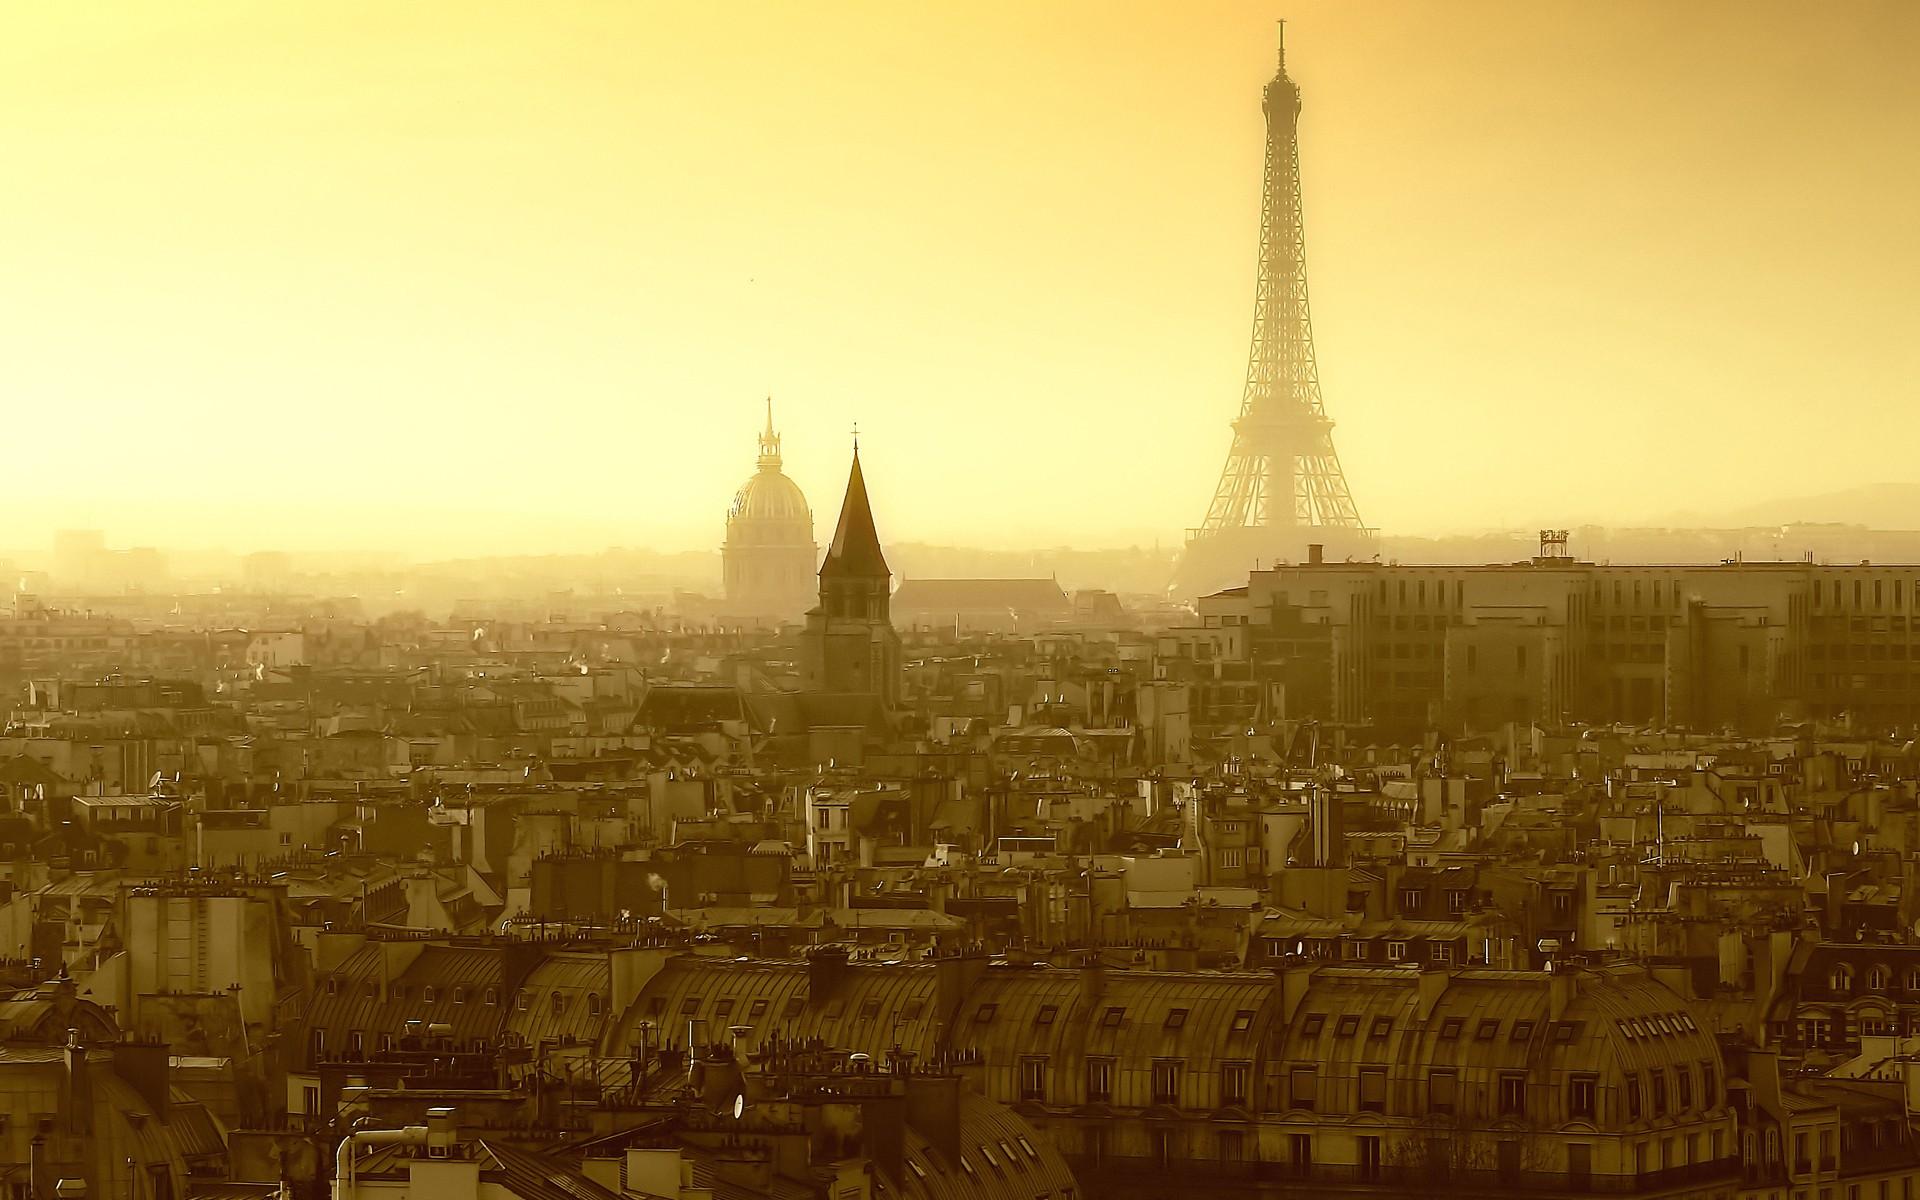 eiffel tower paris travel city skyline wallpaper